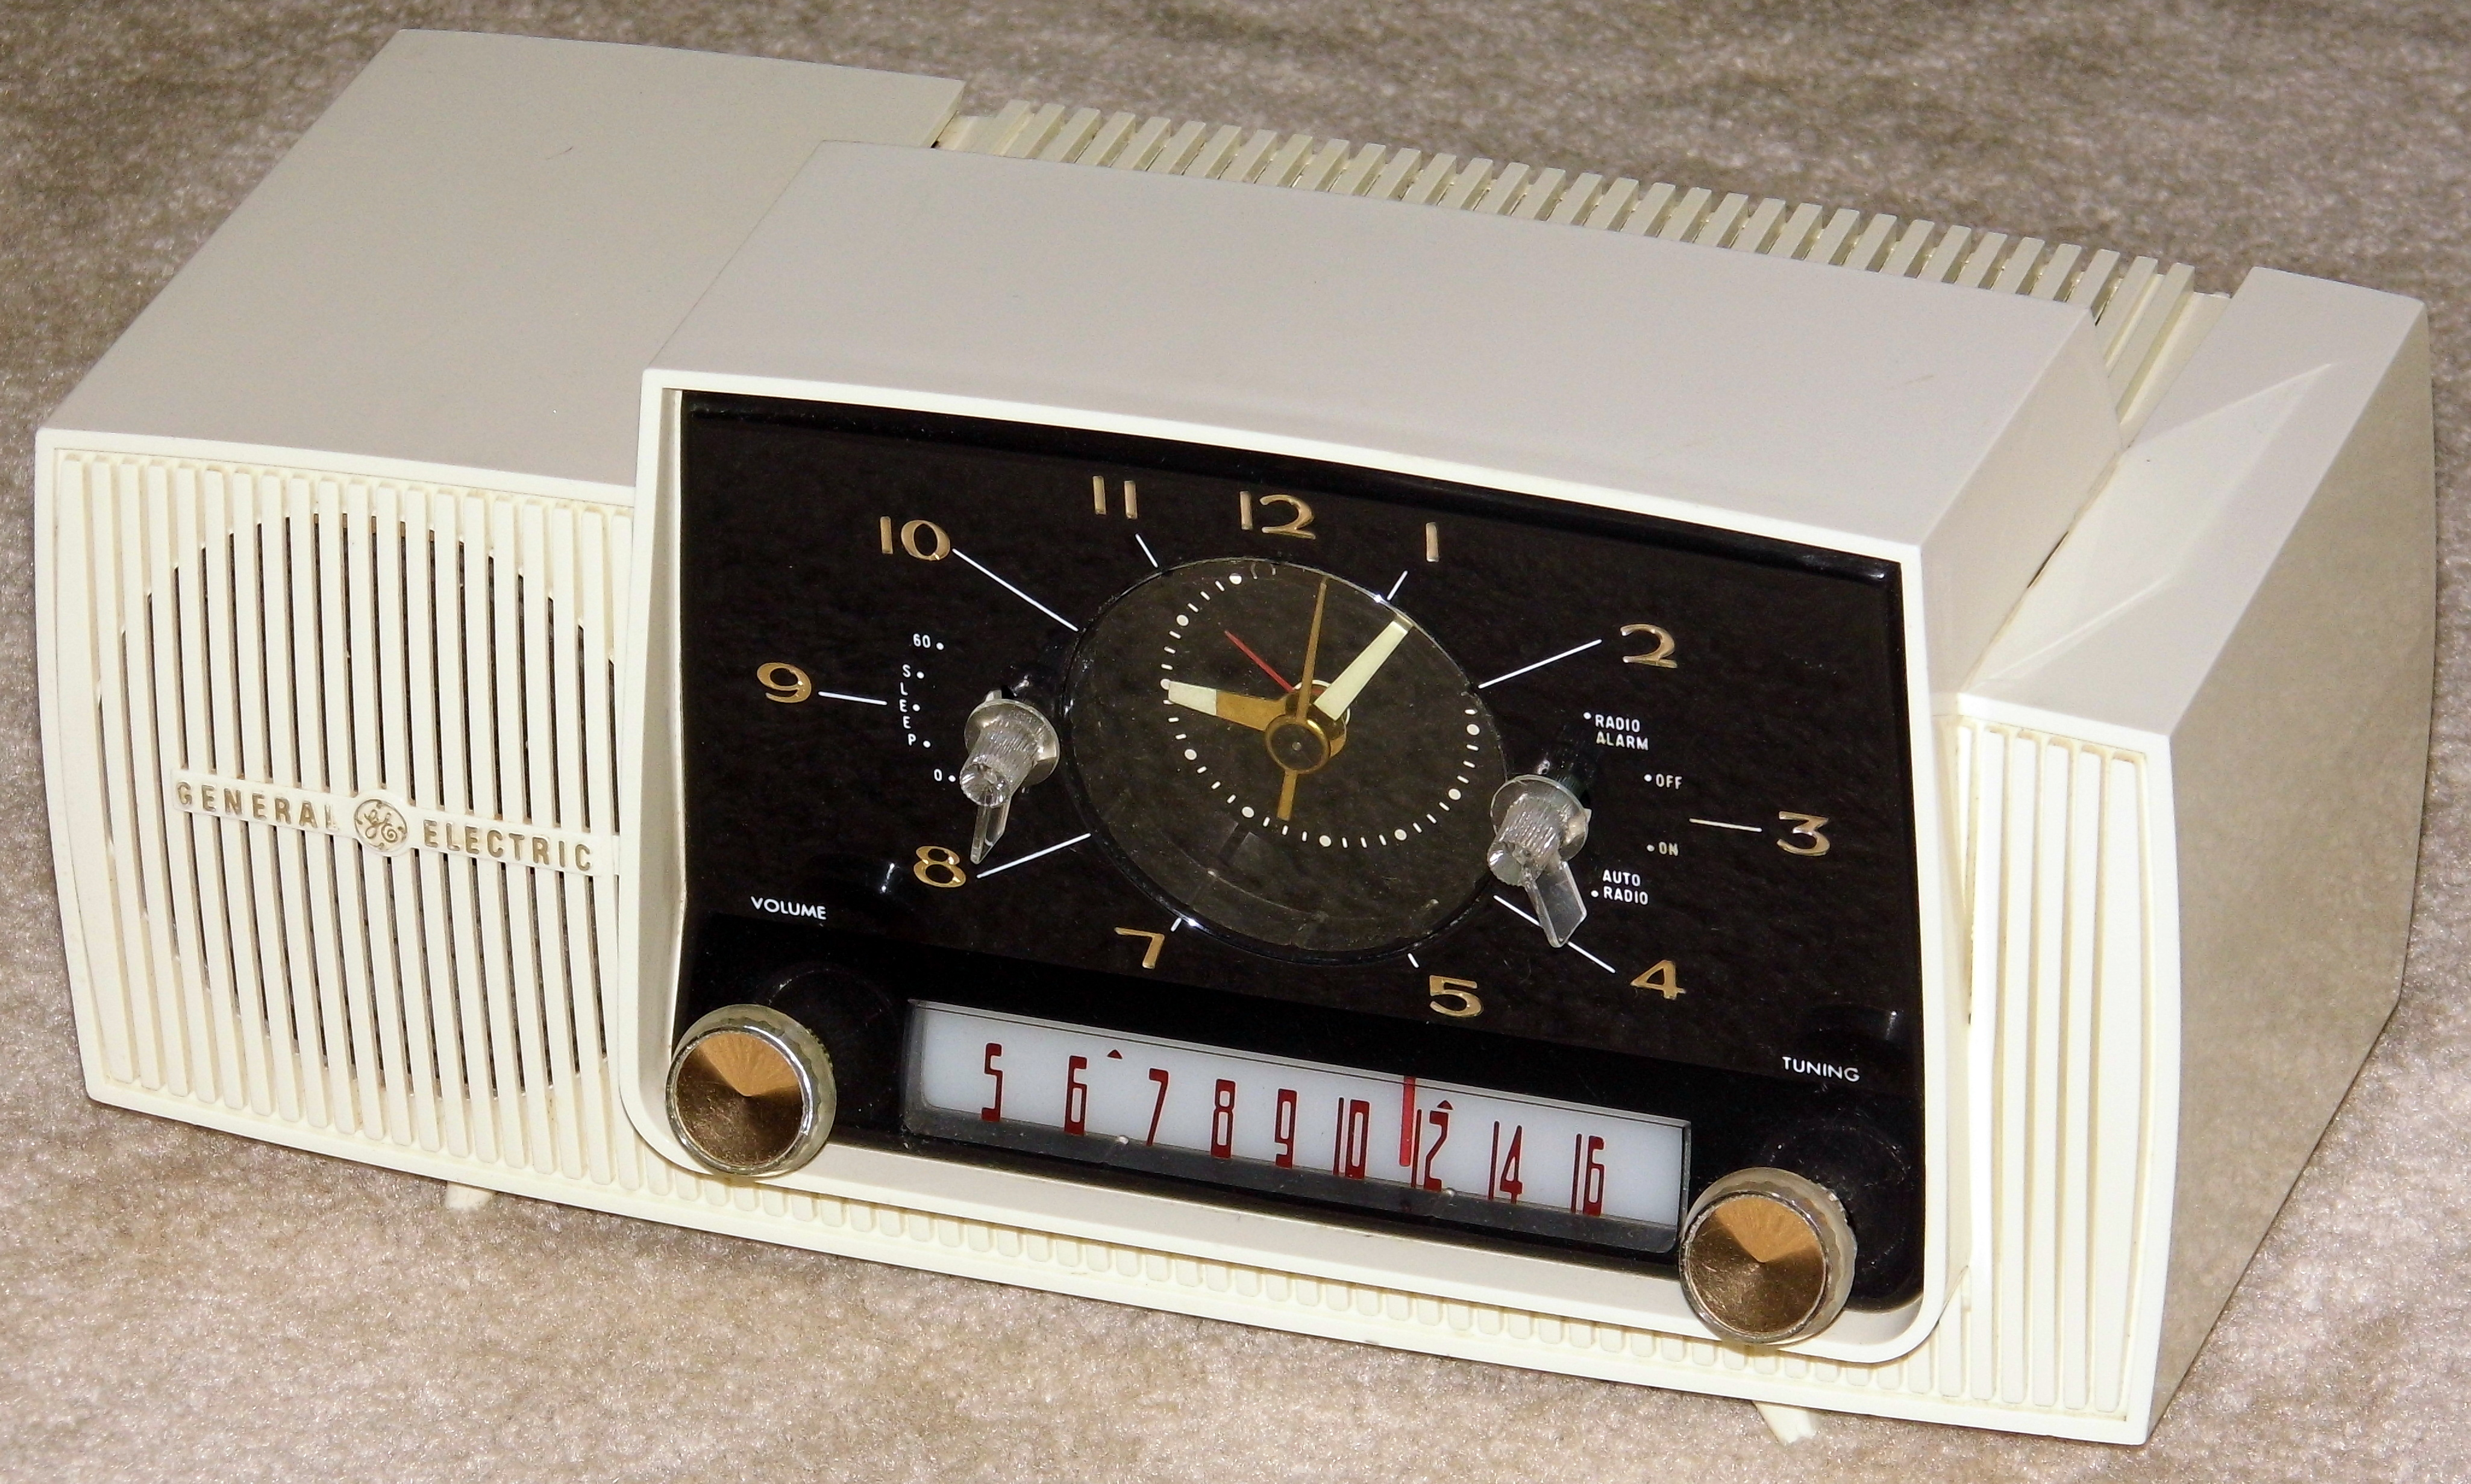 File:Vintage General Electric Plastic Clock Radio, Model C ...